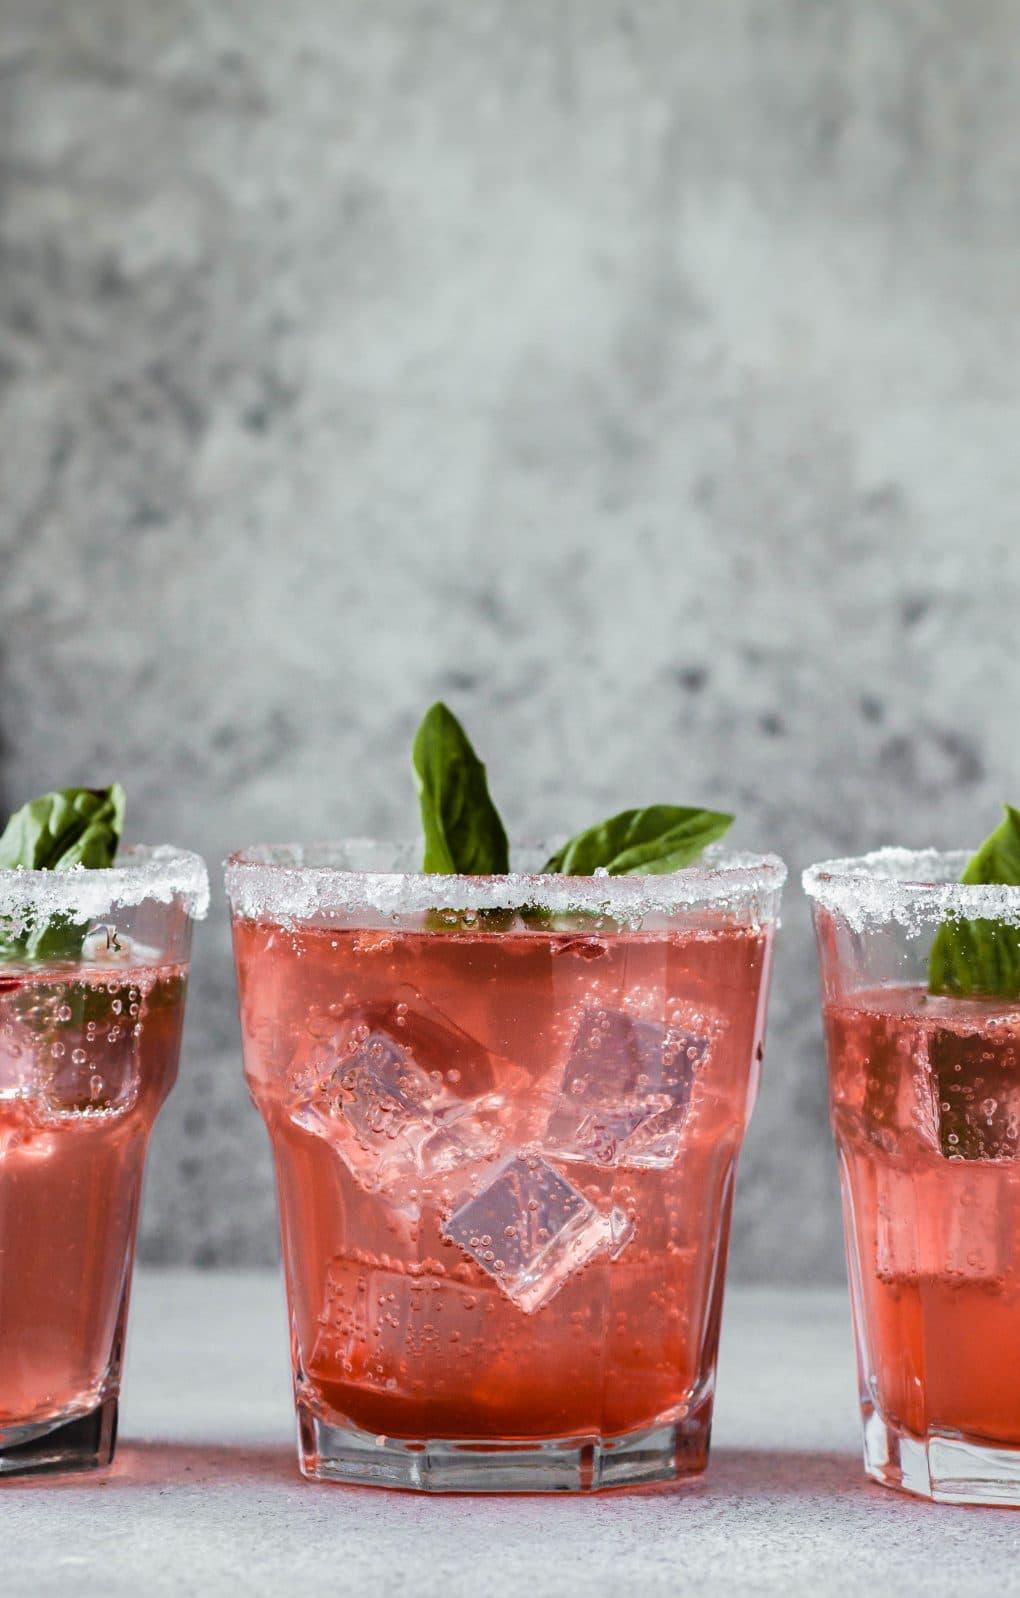 three glasses with pamplemousse la Croix cocktail